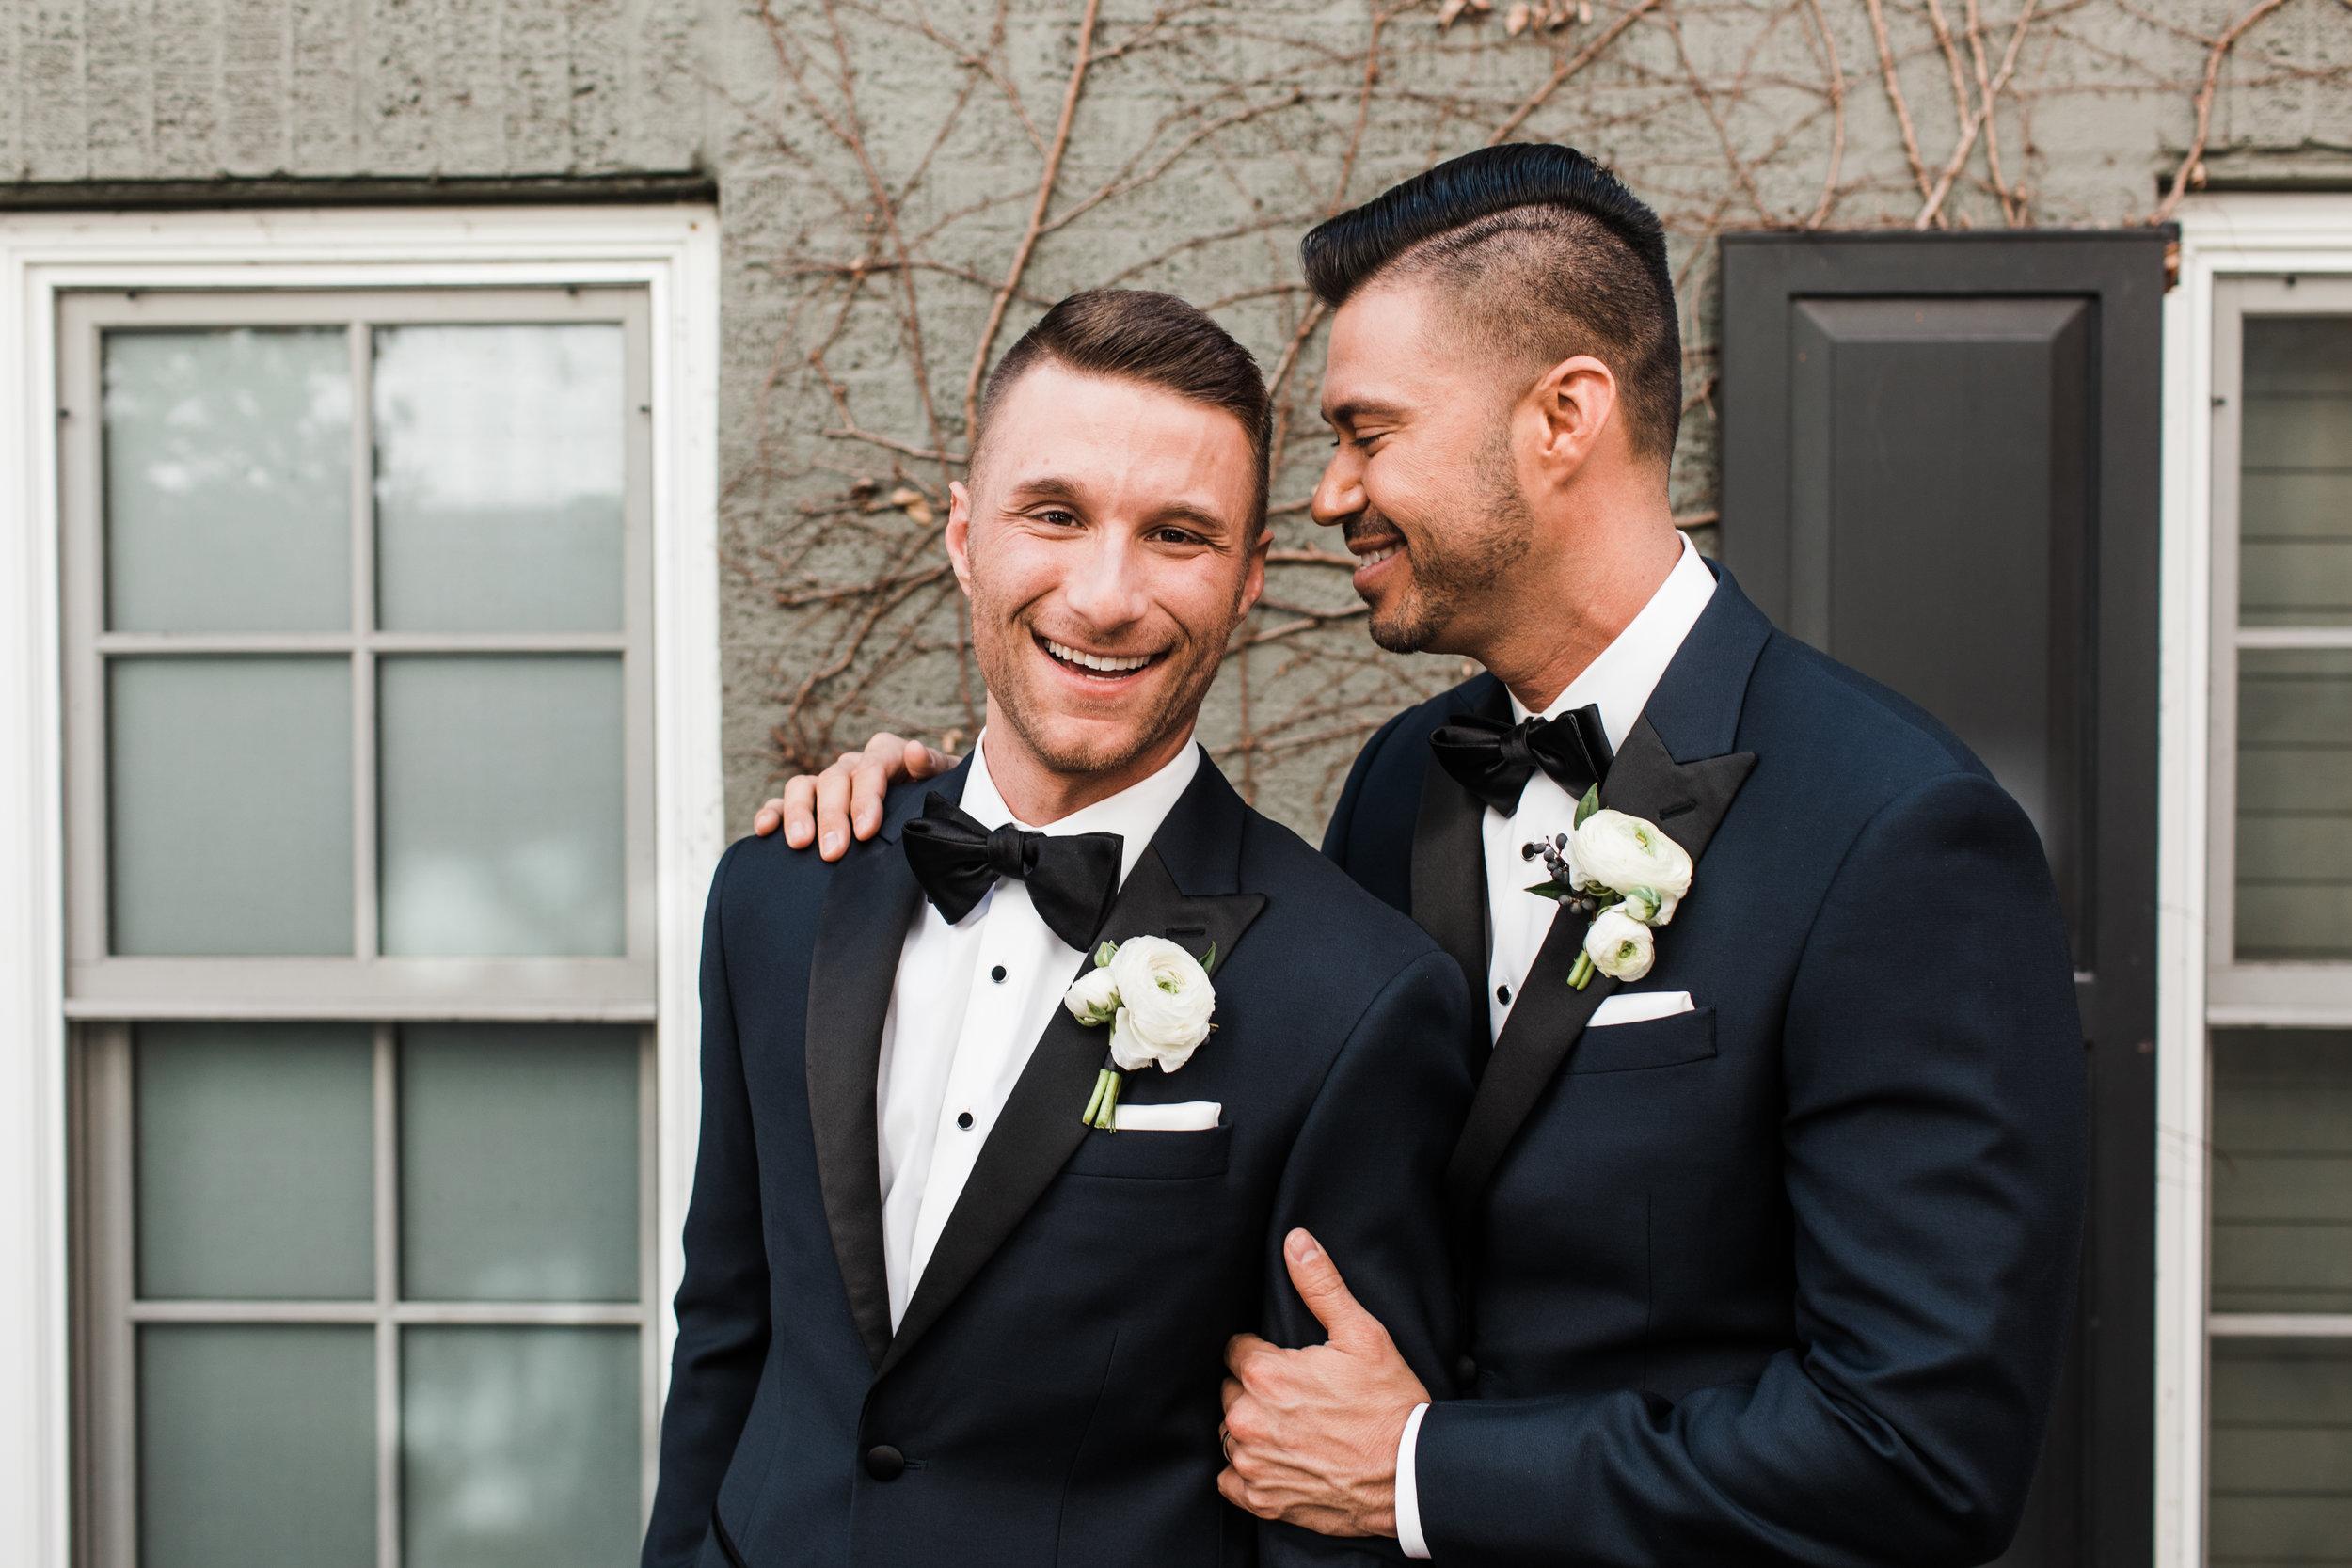 Dallas Wedding at Hotel Zaza and Cathedral of Hope